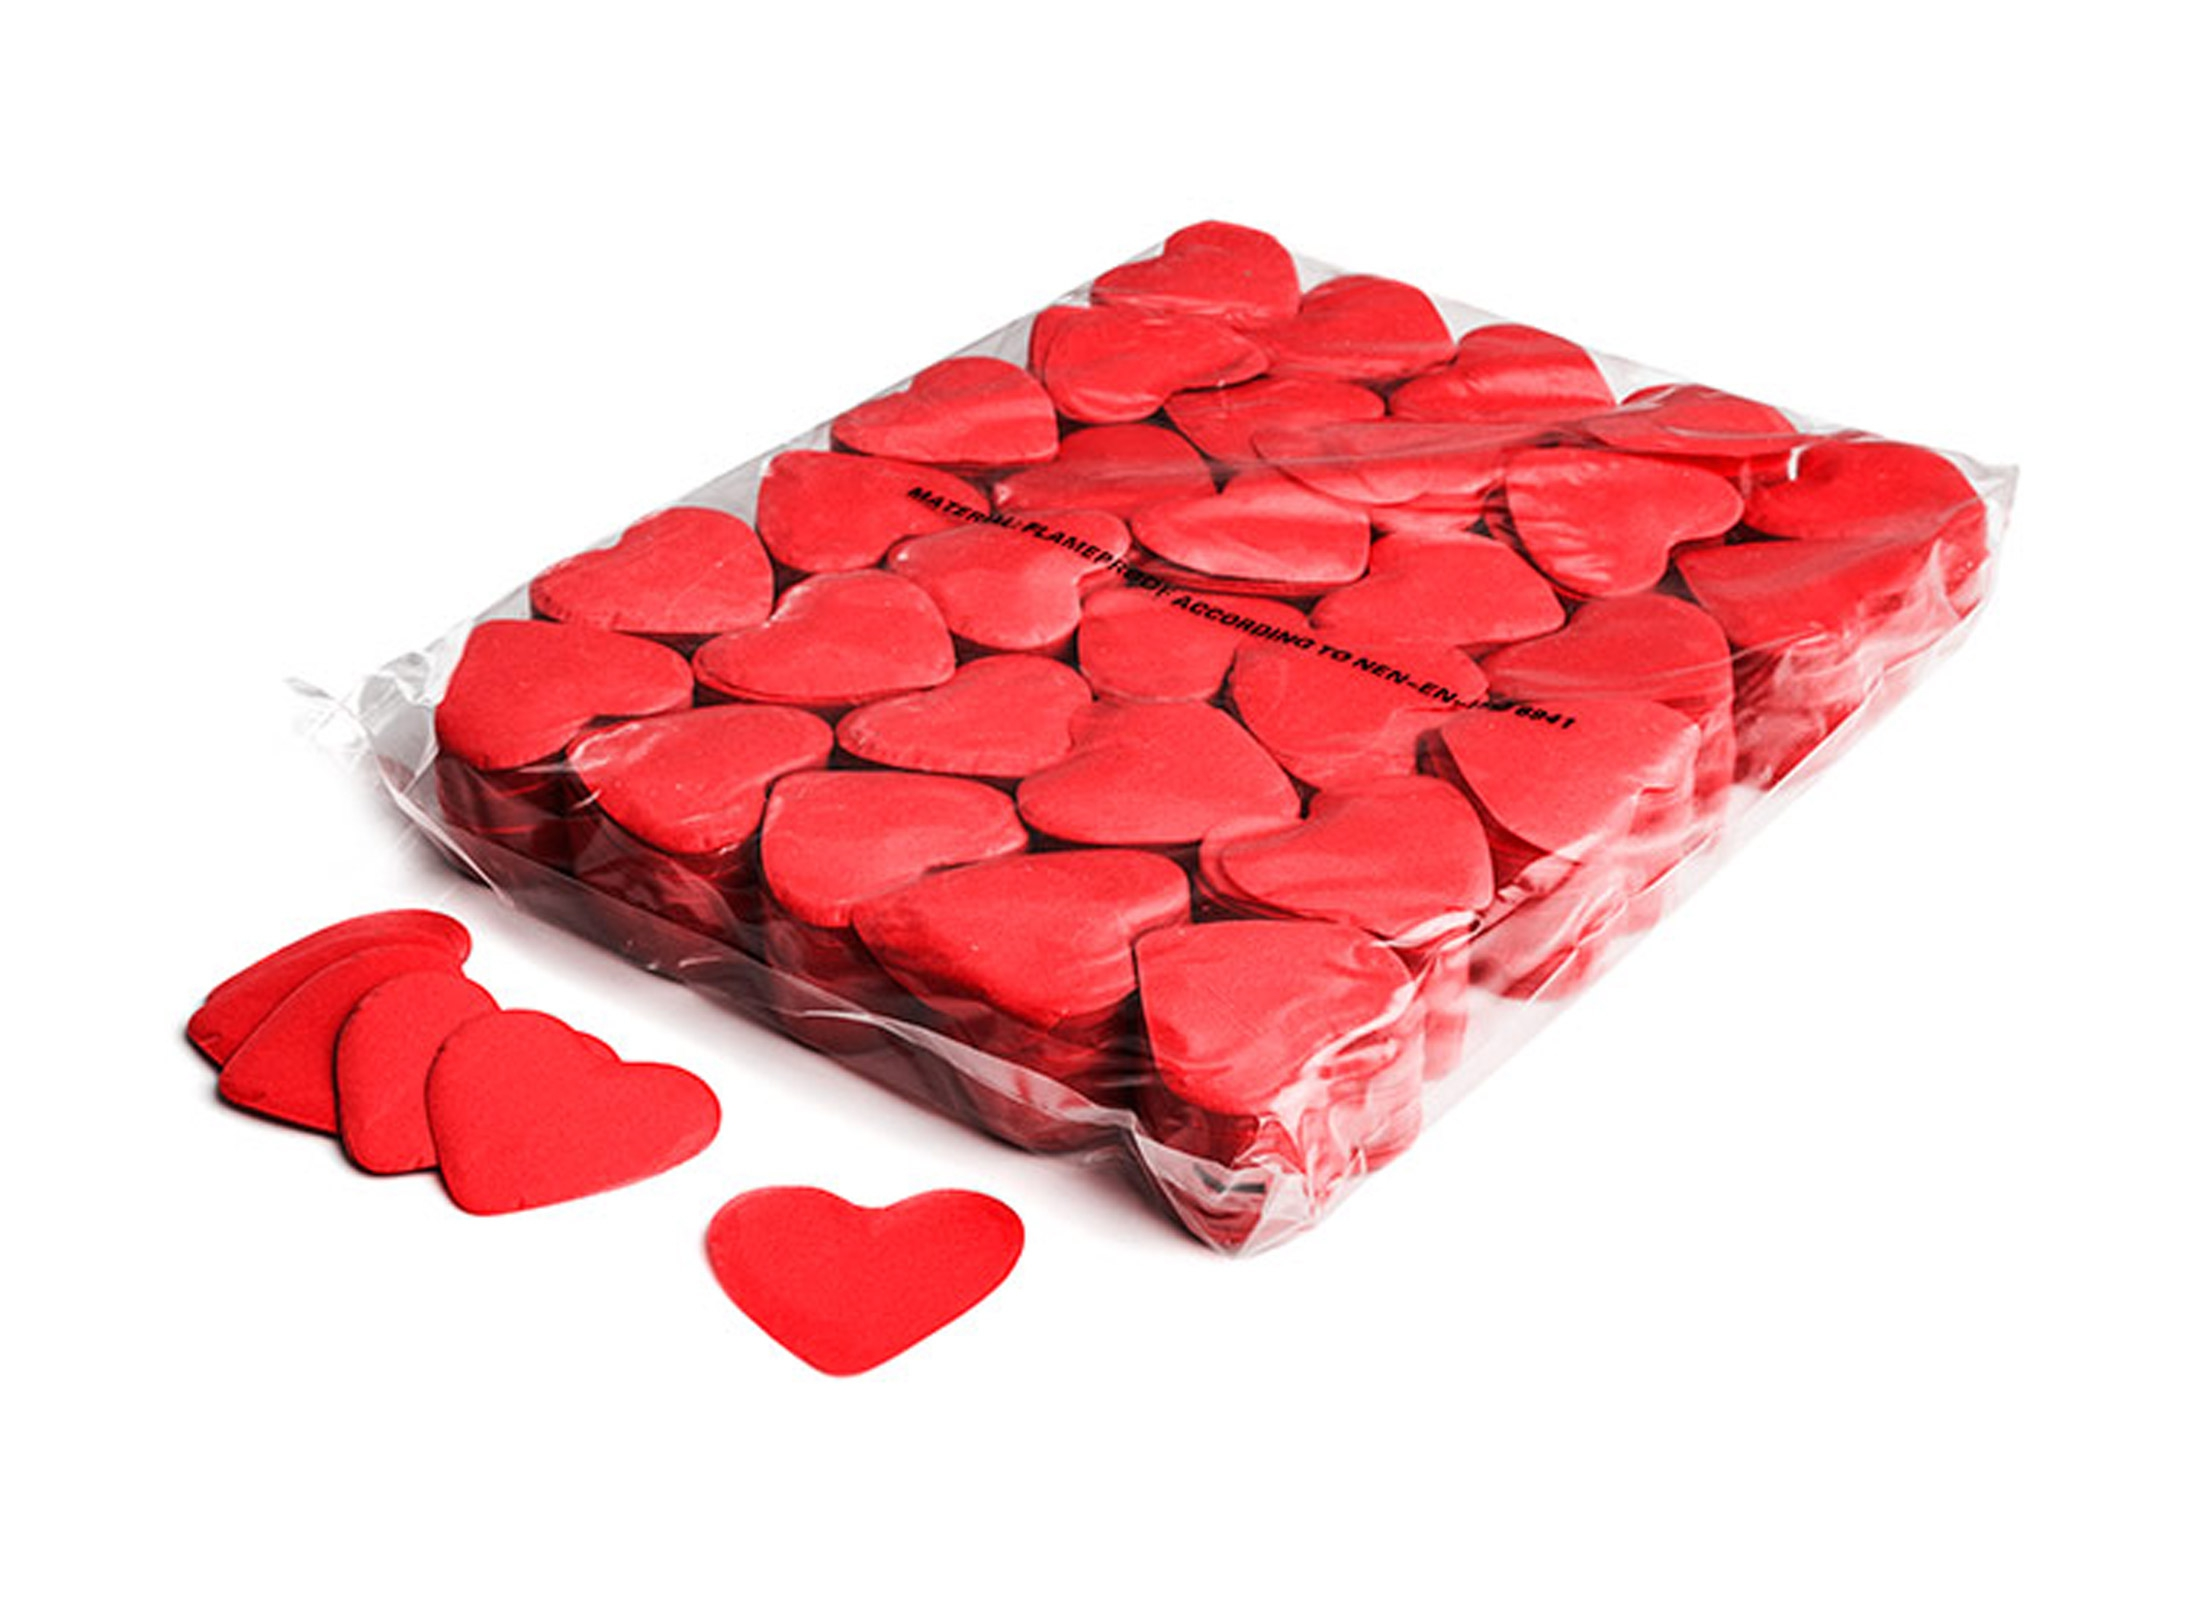 MagicFX Slowfall Confetti, RED, 1kg, Ø55mm Hearts, Paper